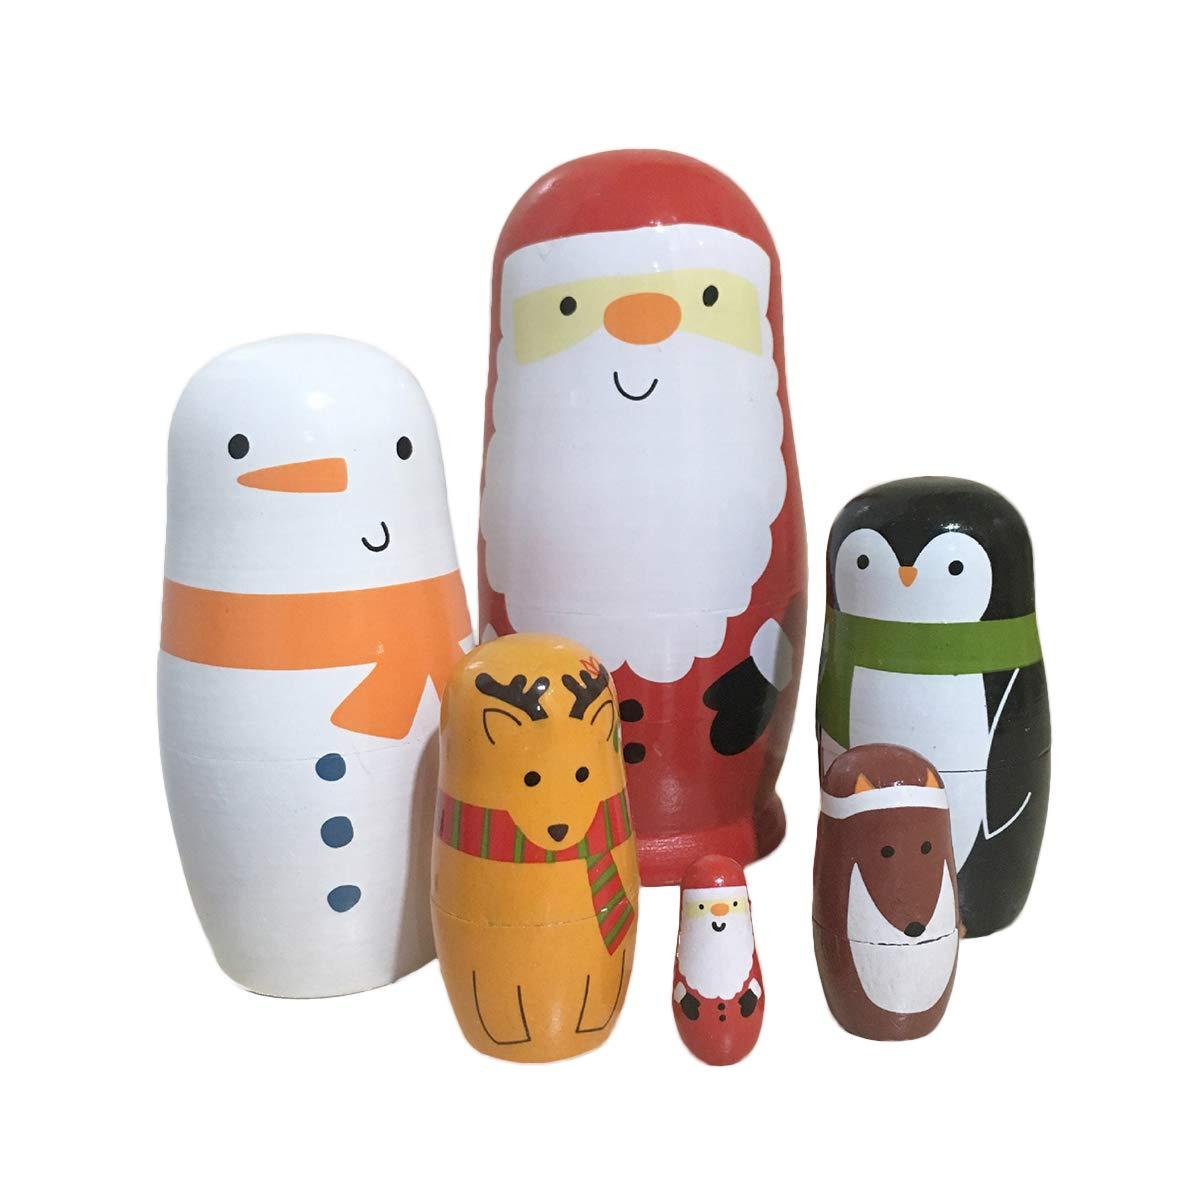 Toyvian 6pcs Nesting Dolls Russian Stacking Dolls Matryoshka Wood Penguins